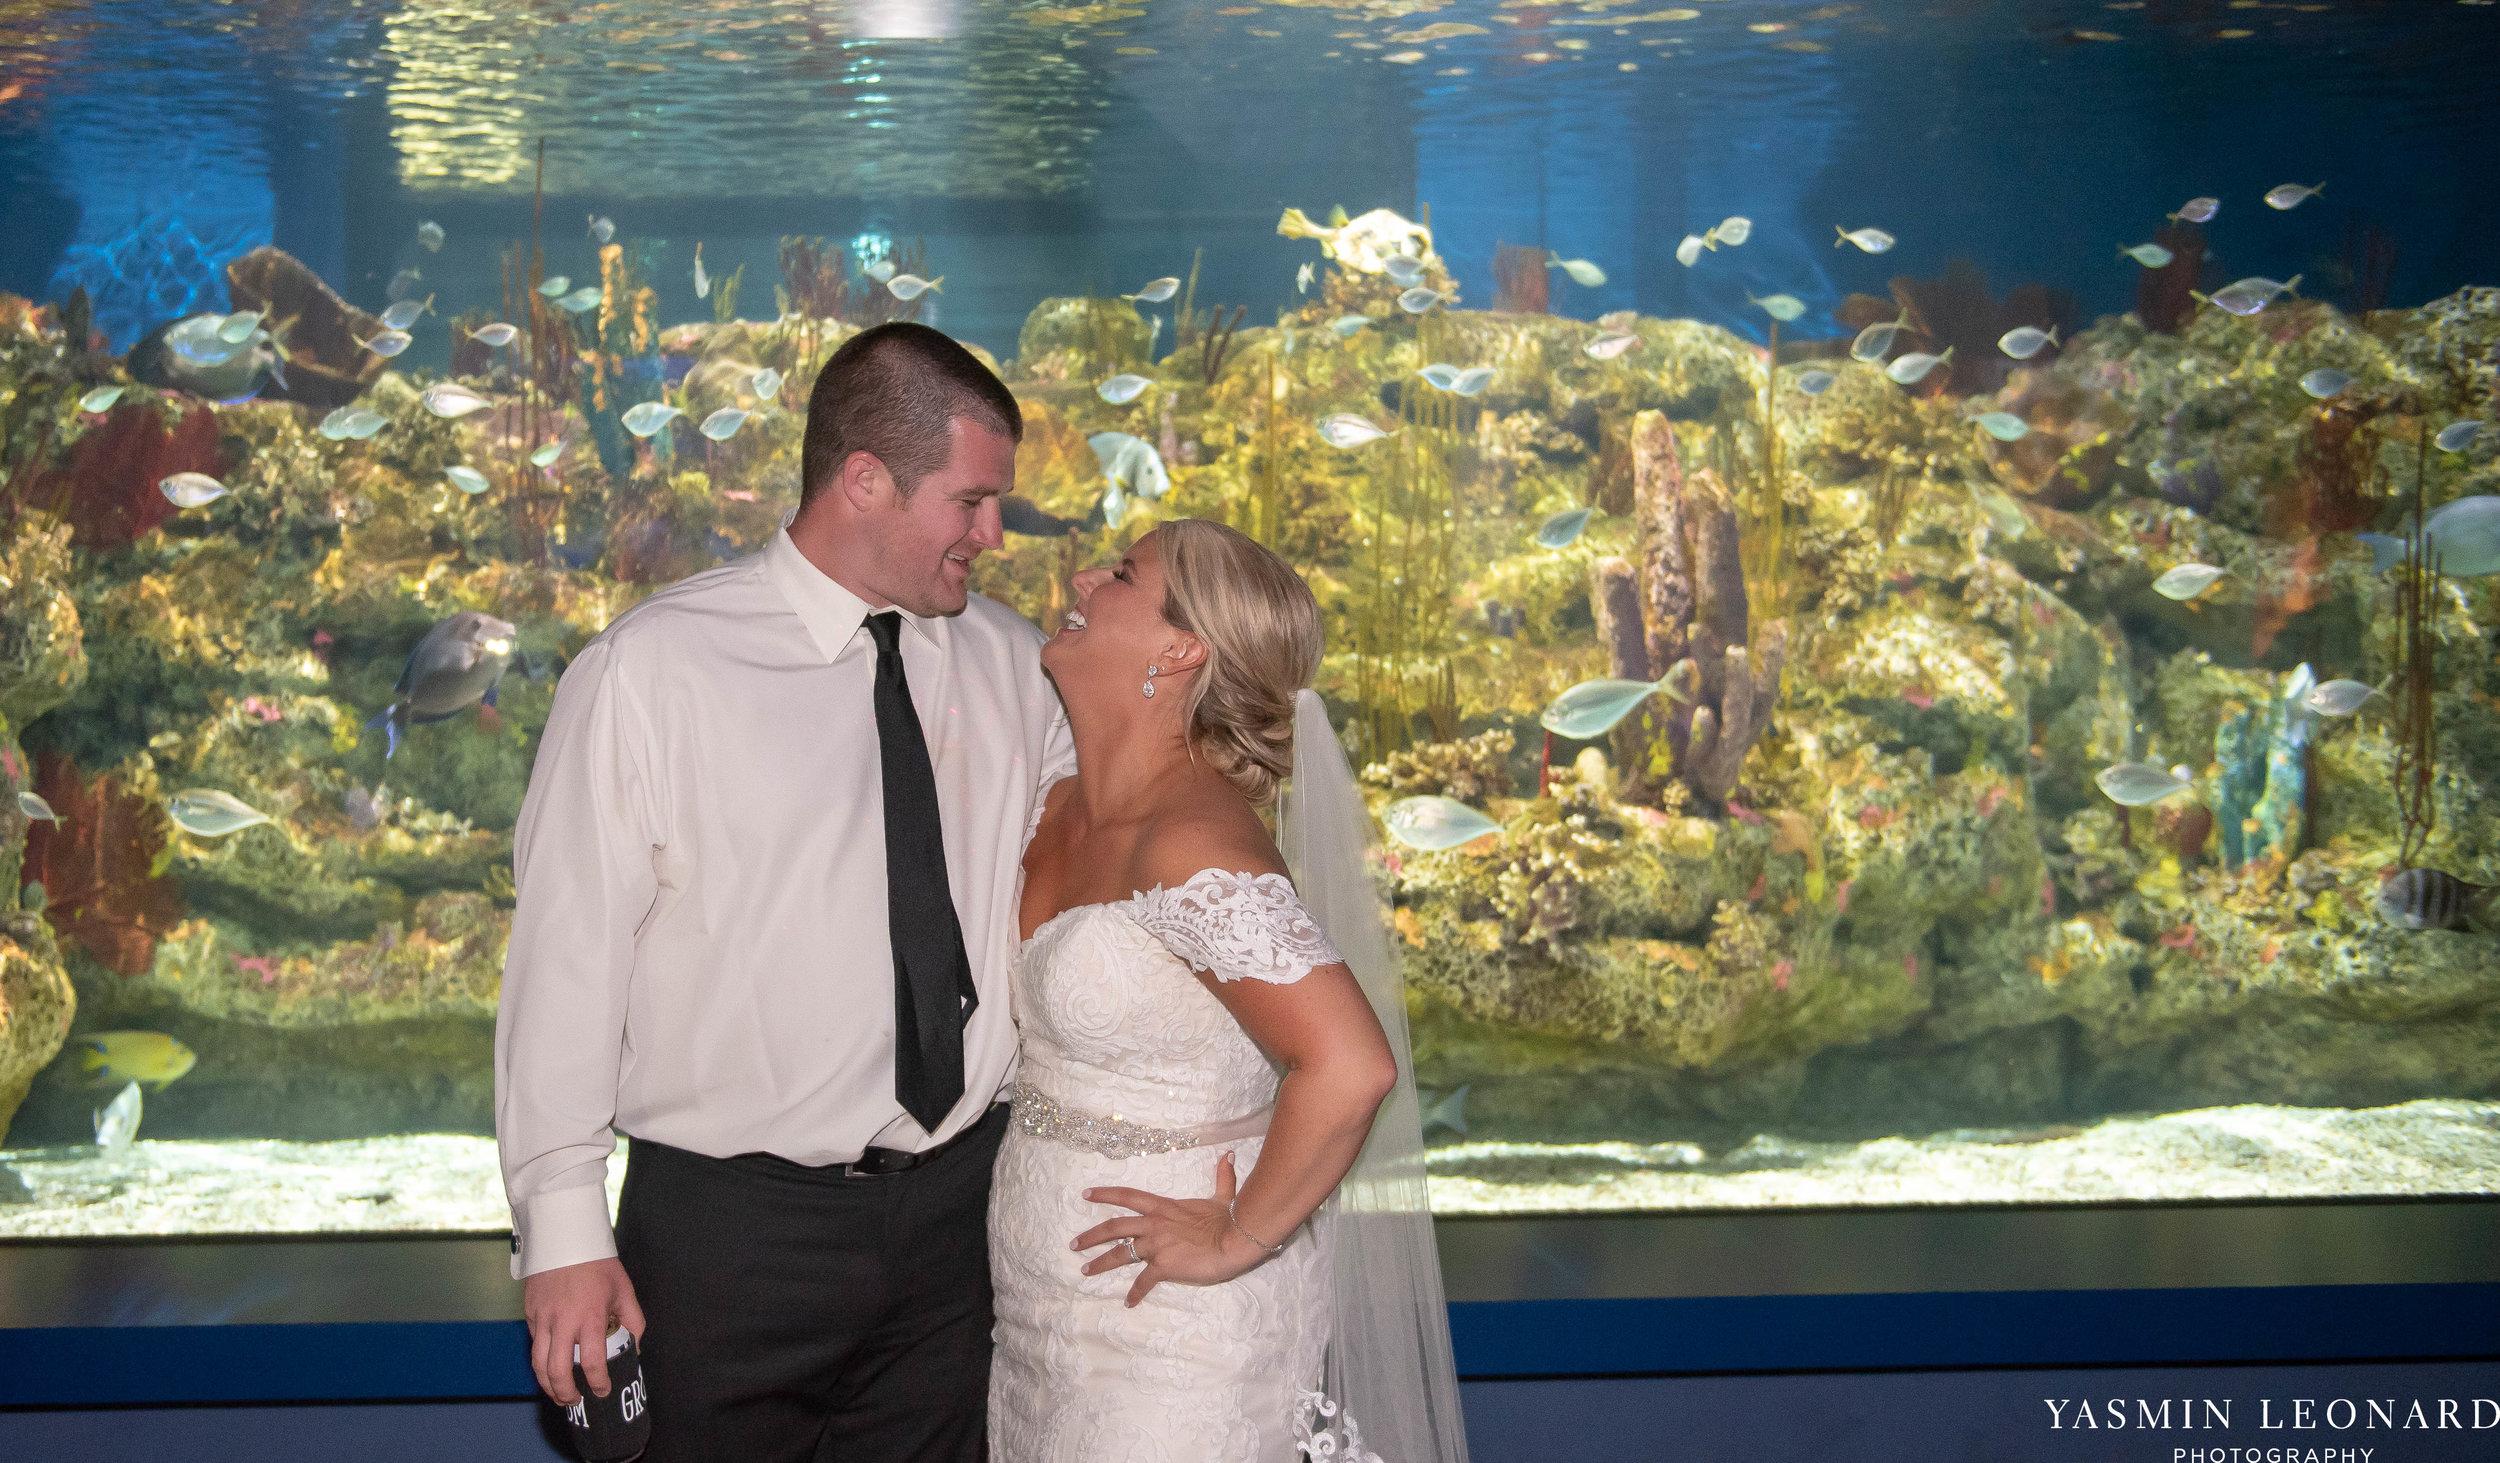 Carolina Beach Wedding - Fort Fisher Wedding - NC Acquarium - Beach Wedding - NC Wedding - Beach Wedding Inspiration - Beach Bride-55.jpg